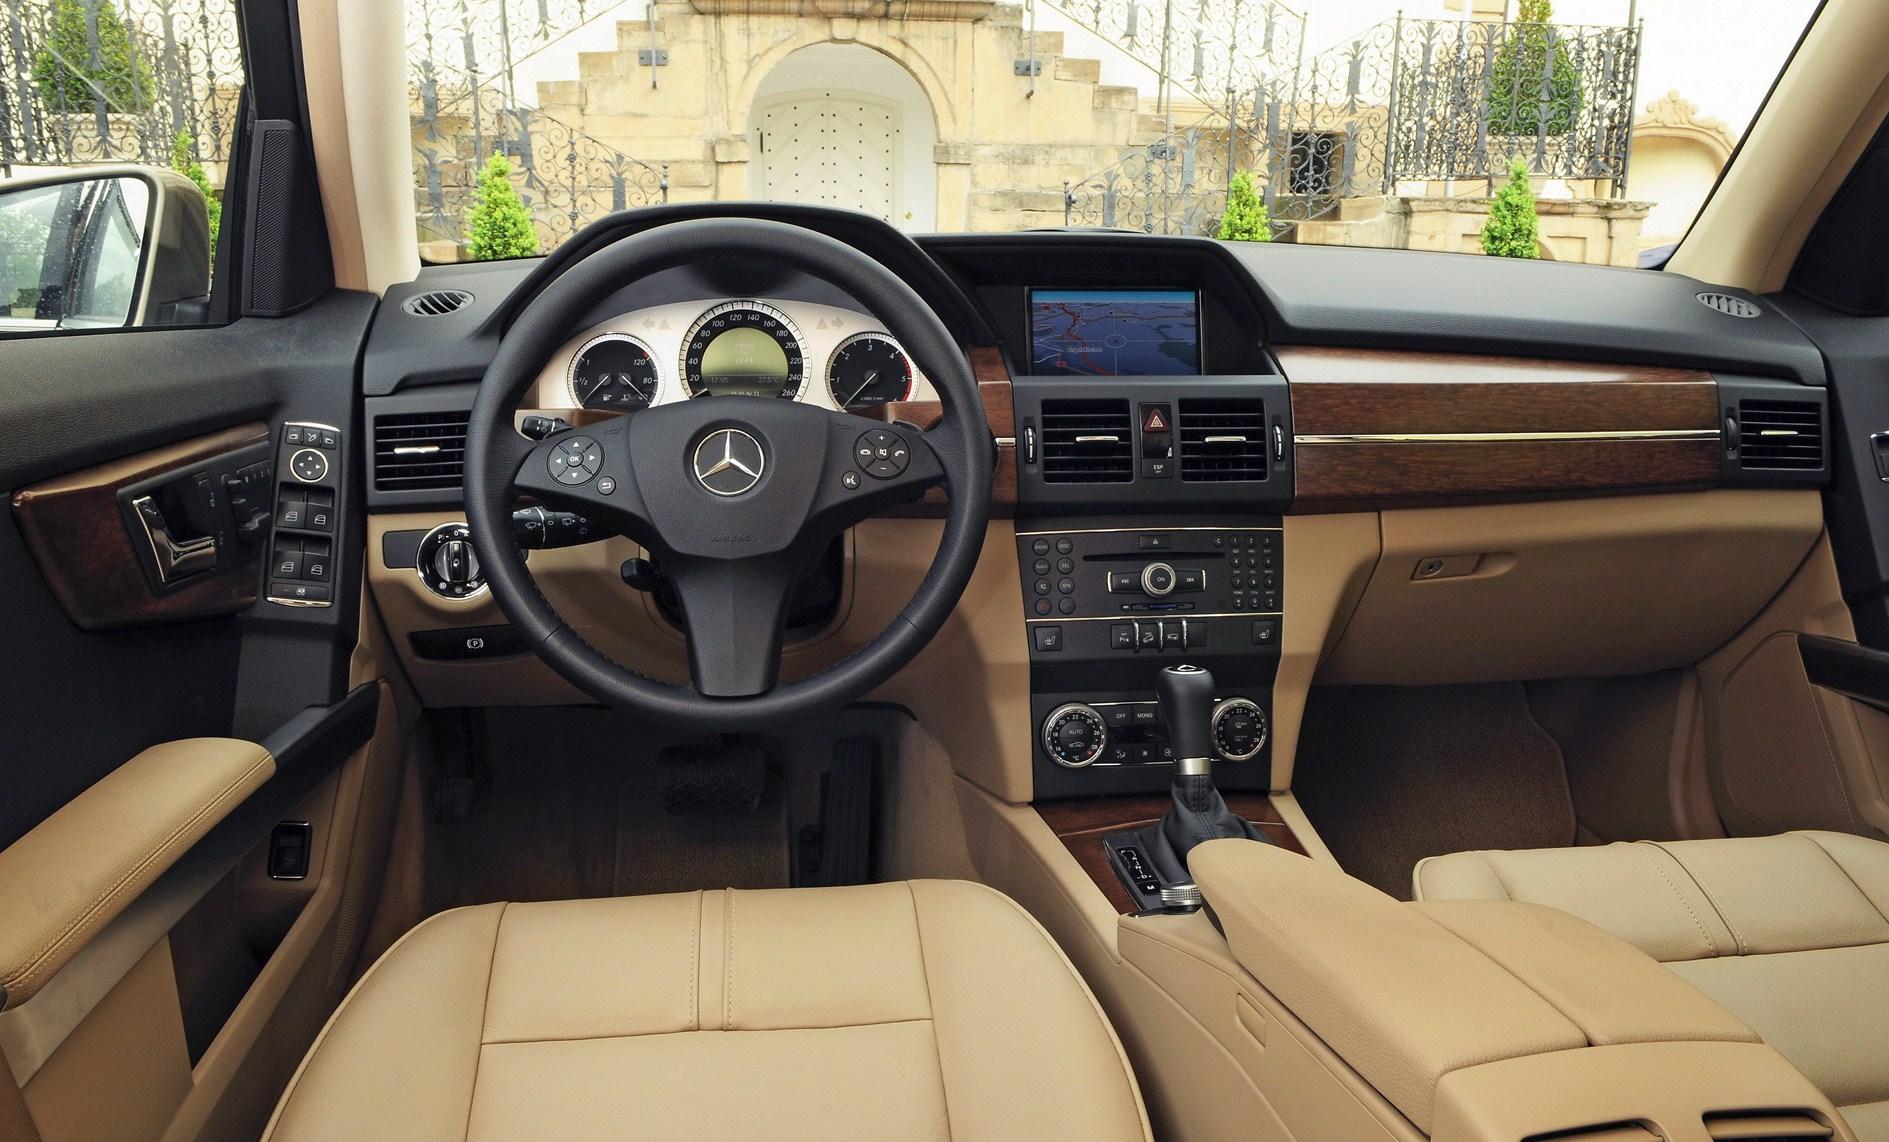 Alfa Romeo Usa >> Mercedes-Benz GLK 320 image #6